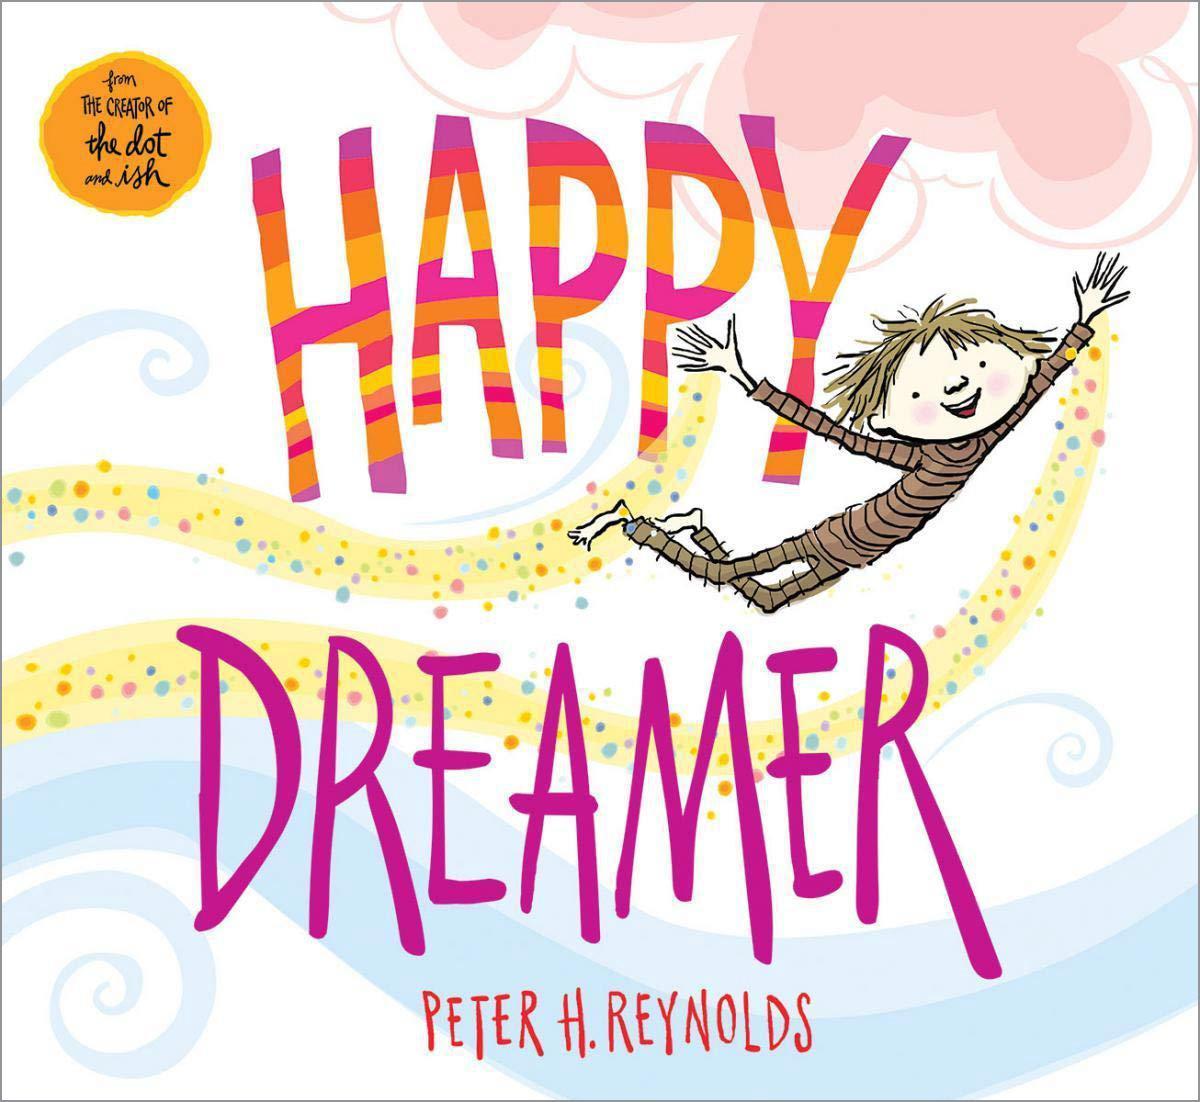 Cover of book, Happy Dreamer